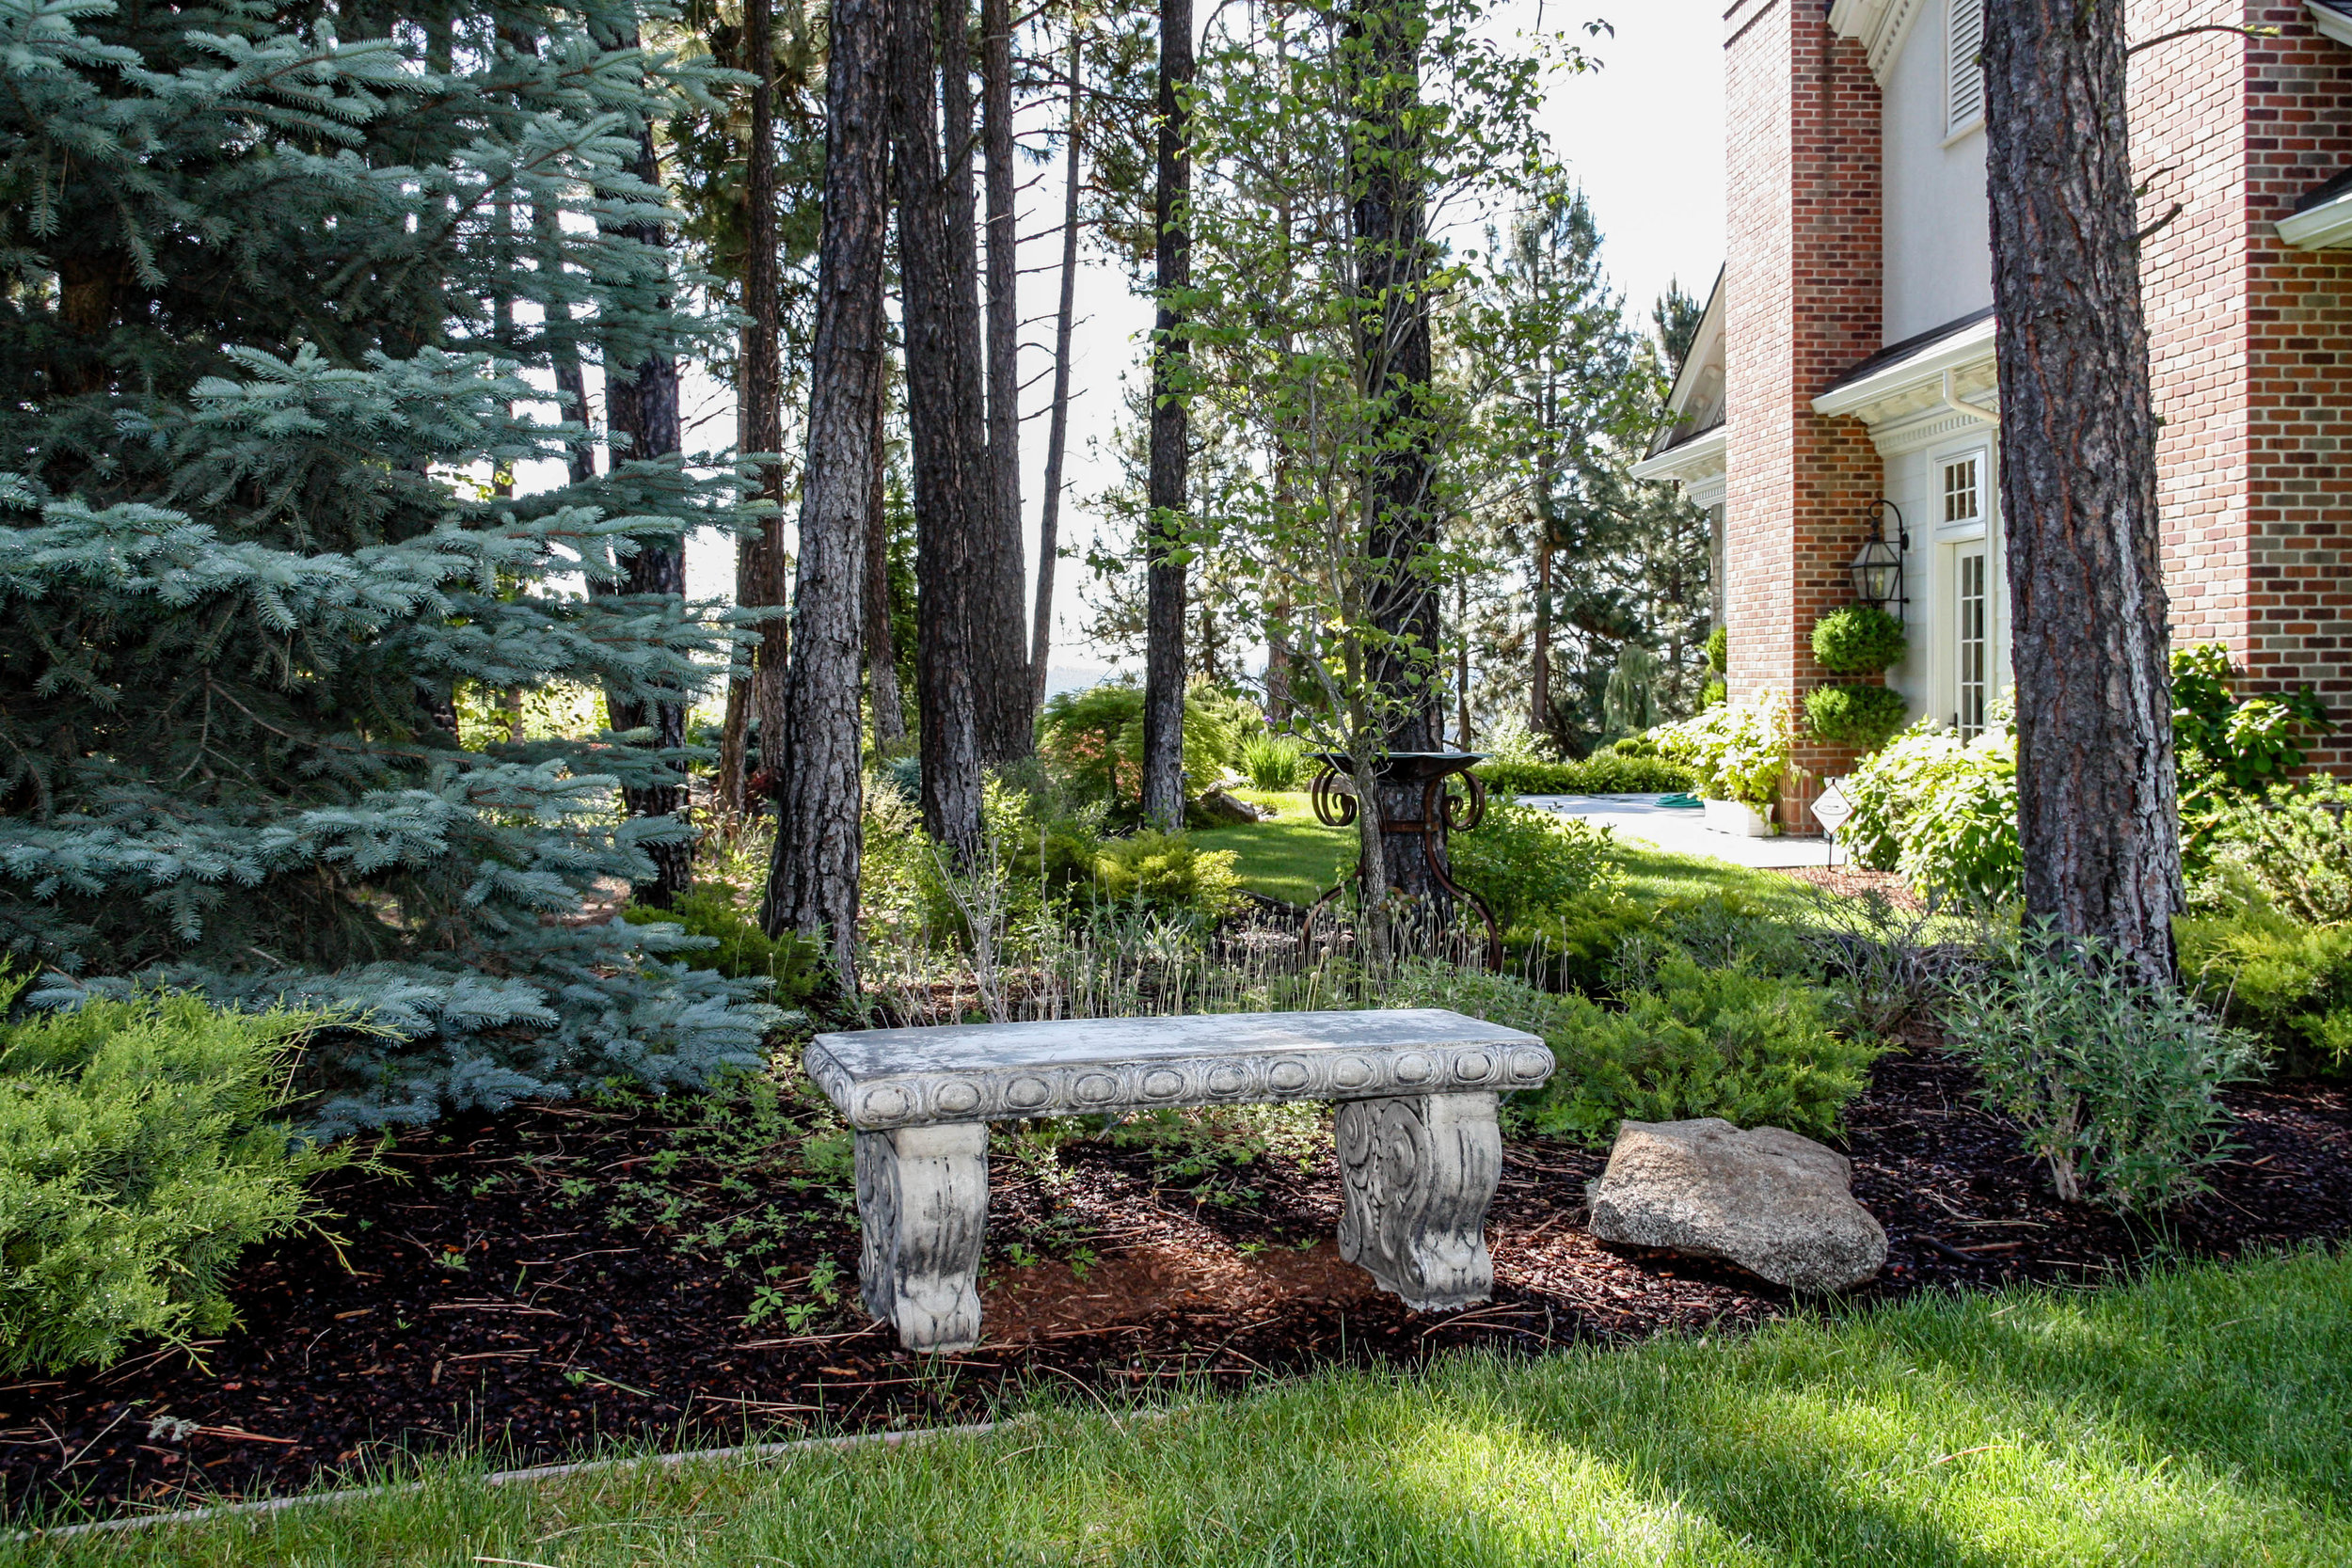 spokane rural estate landscaping bench in woods